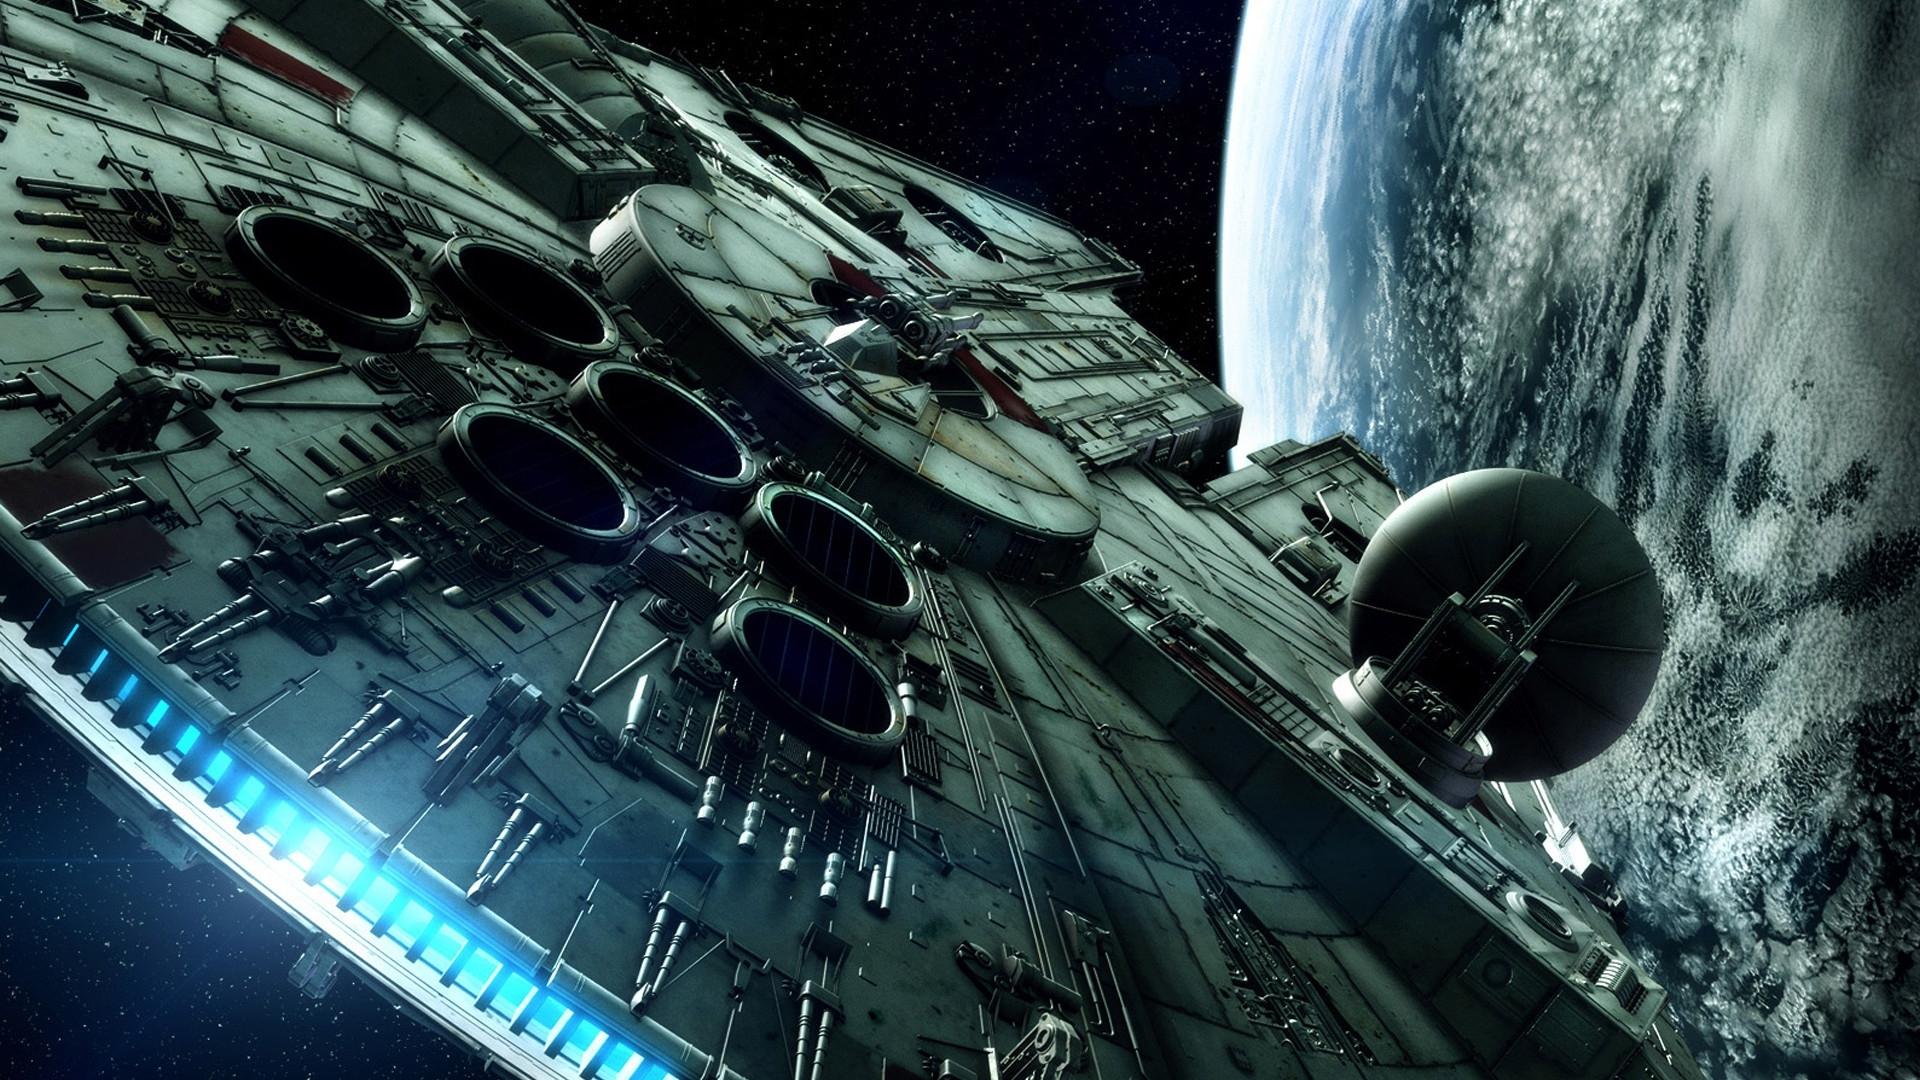 star wars wallpaper 1080p (73+ images)